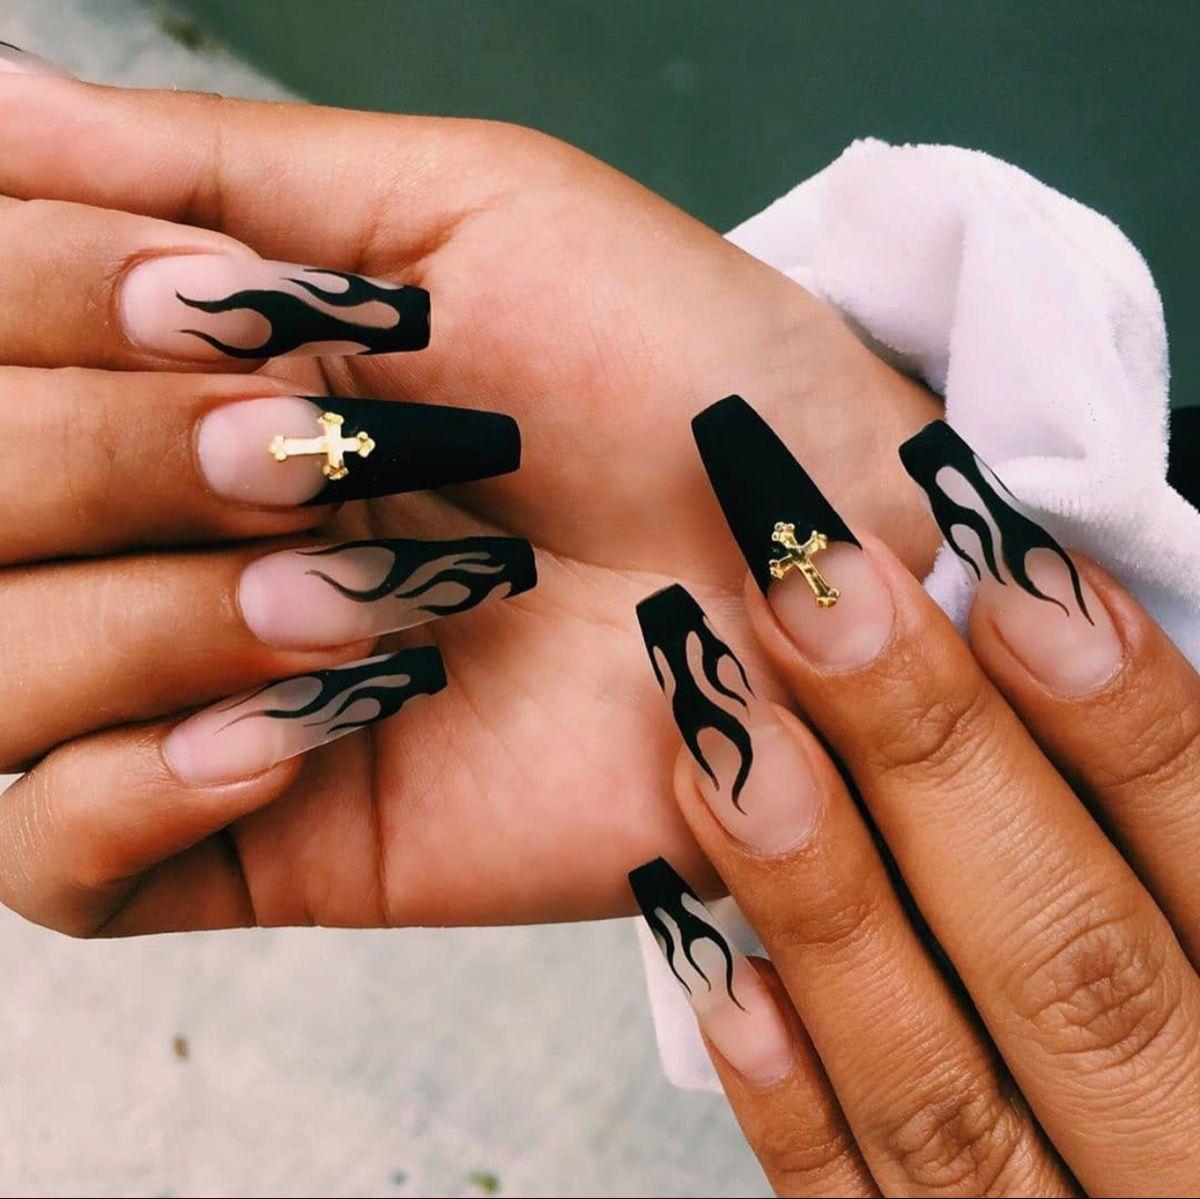 Matte Black Flame Acrylics In 2020 Halloween Acrylic Nails Fall Acrylic Nails Acrylic Nails